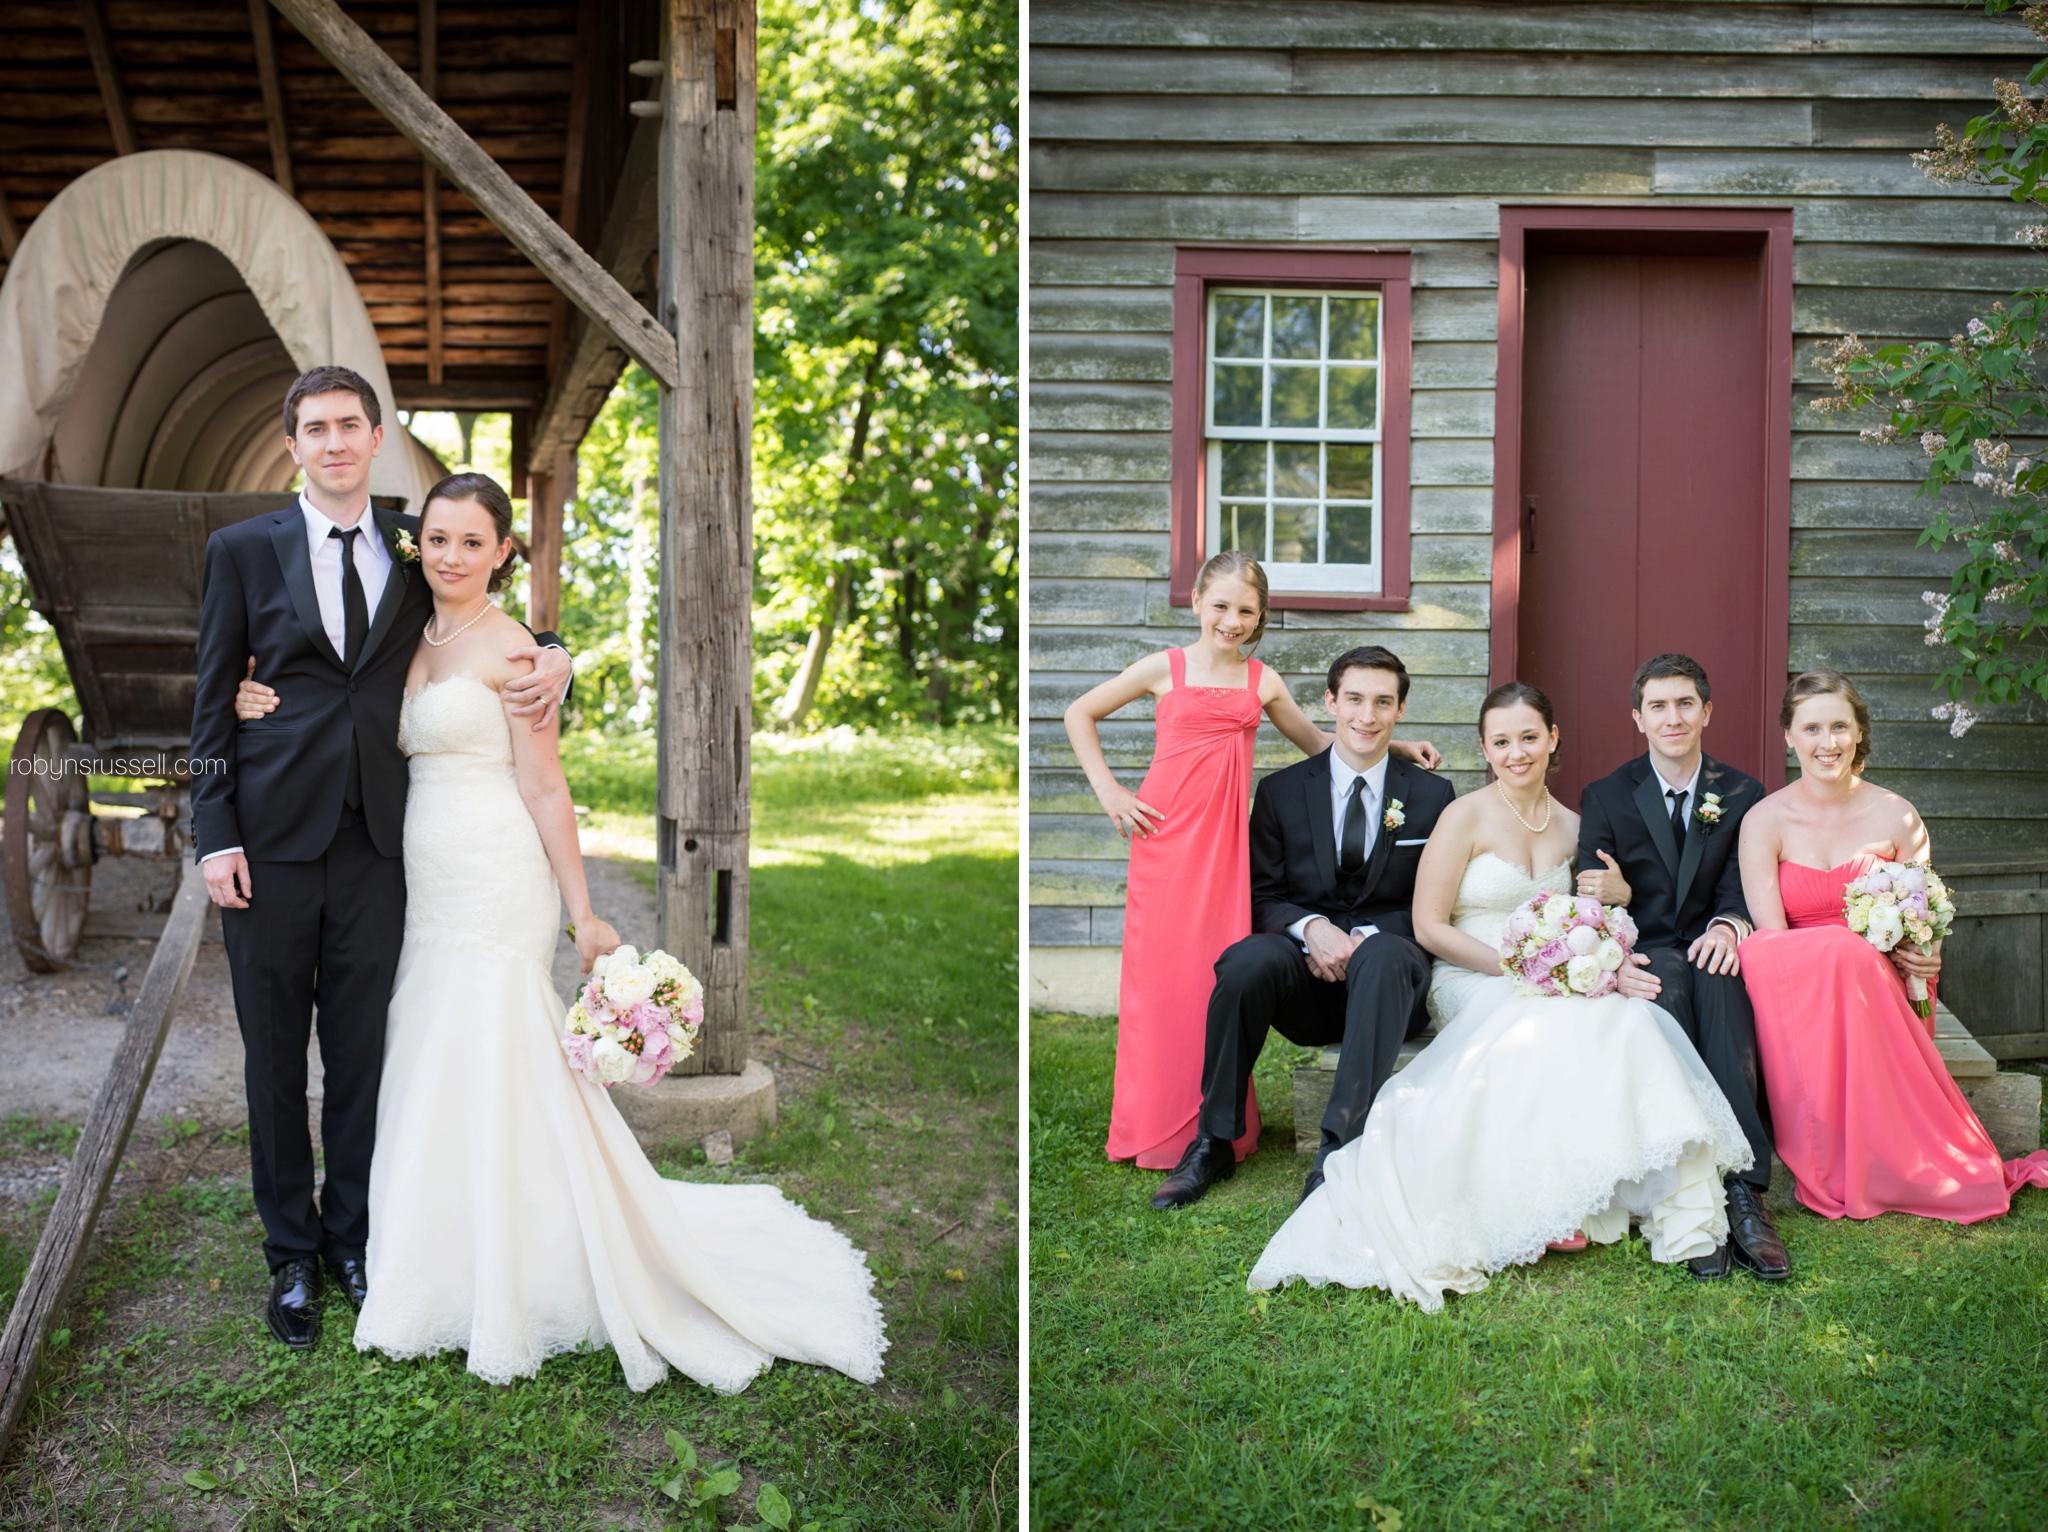 25-bridal-party-in-historic-jordan-barn.jpg